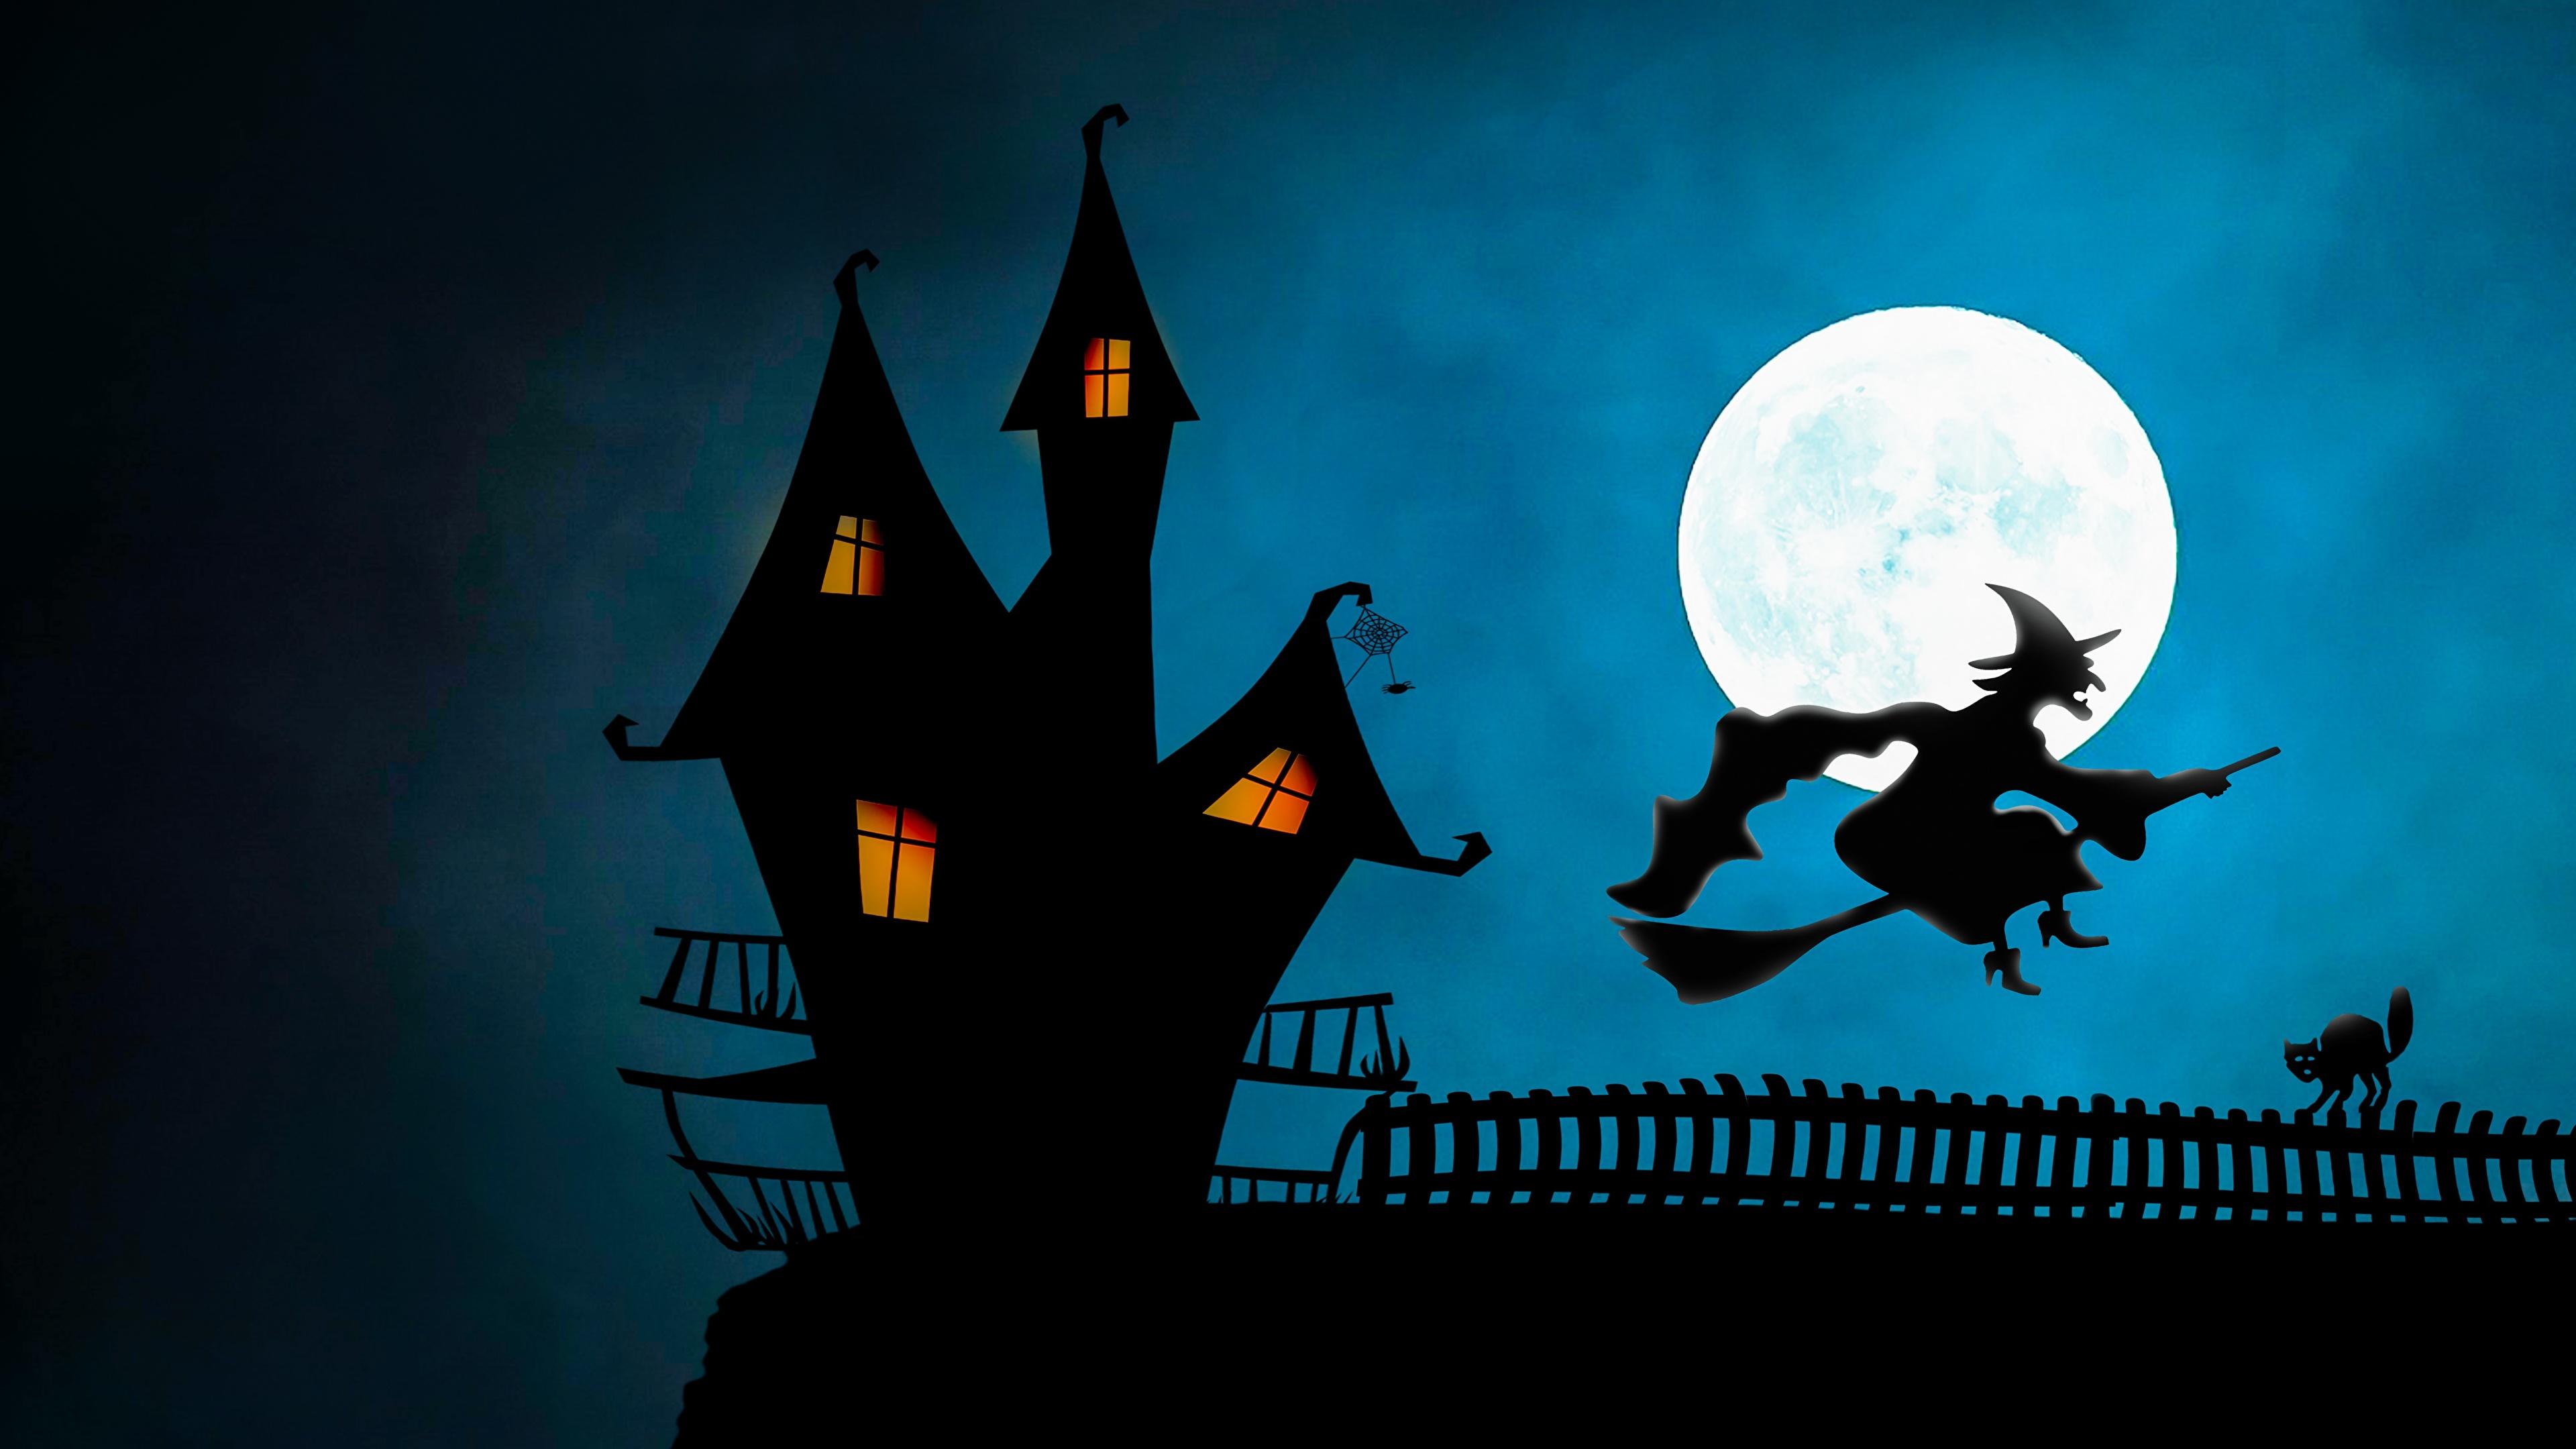 Картинки Хэллоуин Ведьма силуэта Замки луны 3840x2160 Силуэт силуэты Луна луной